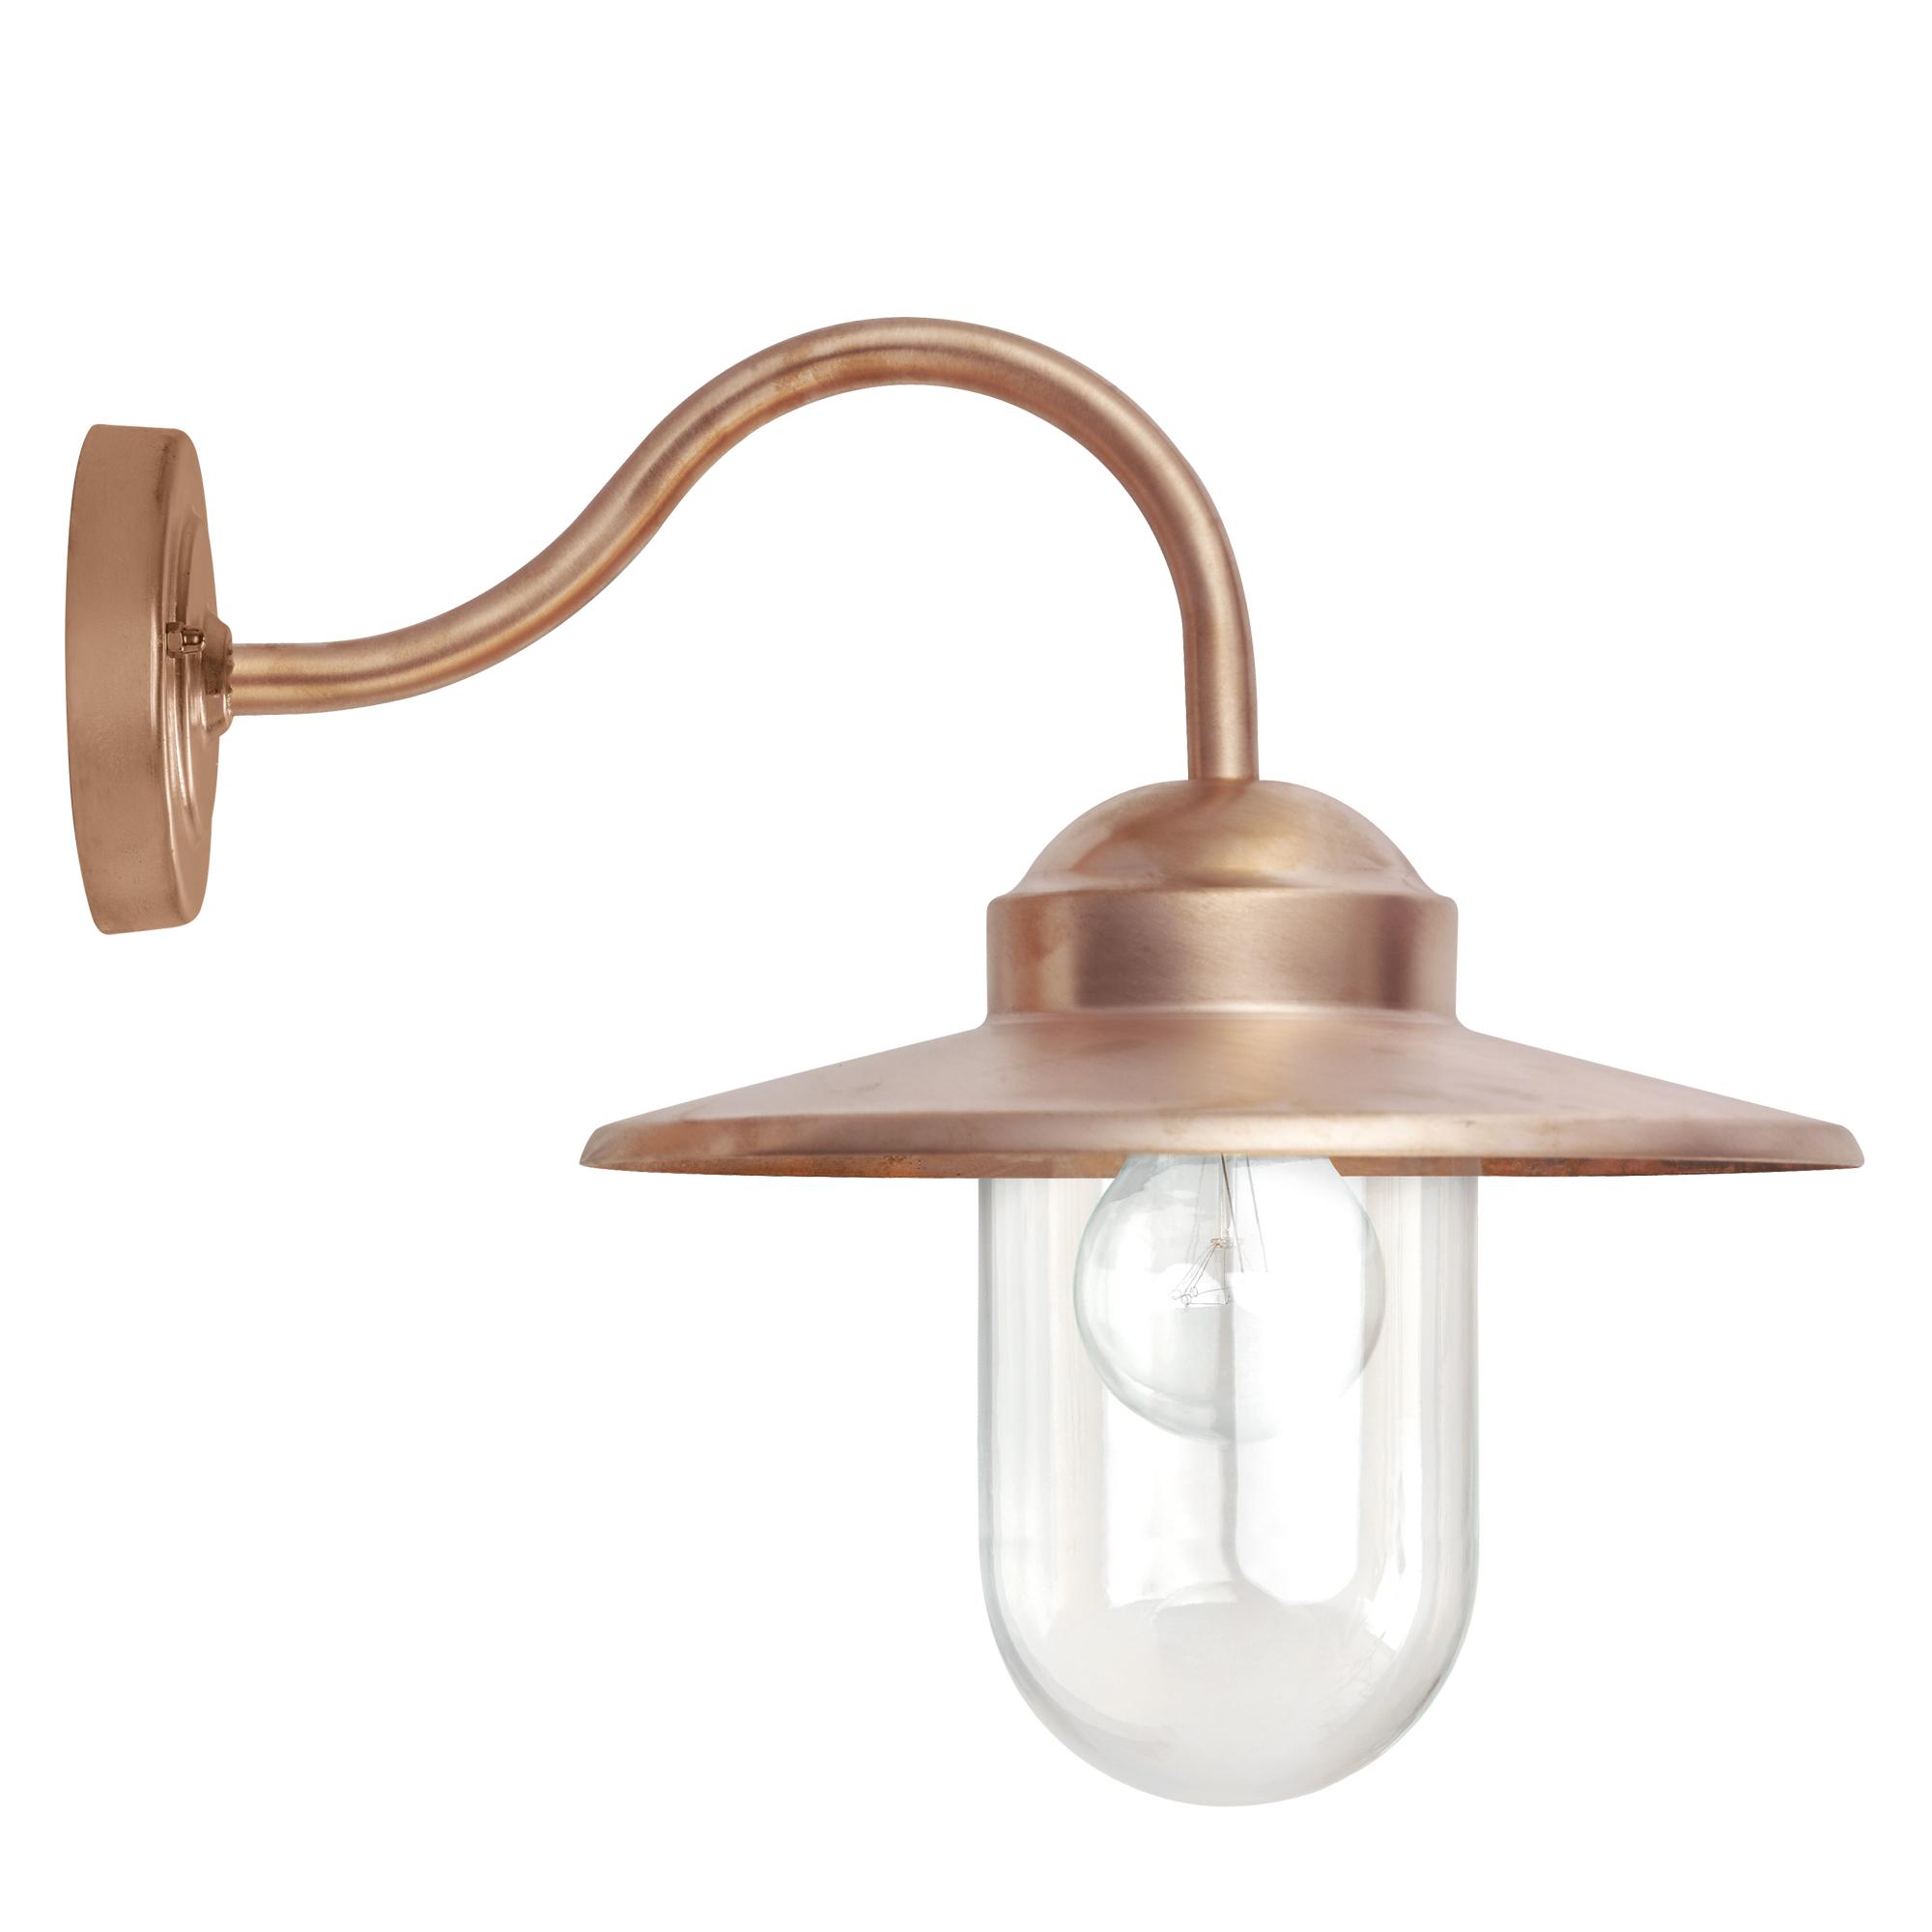 Buitenlamp Dolce Koper Dag Nacht Schemersensor LED